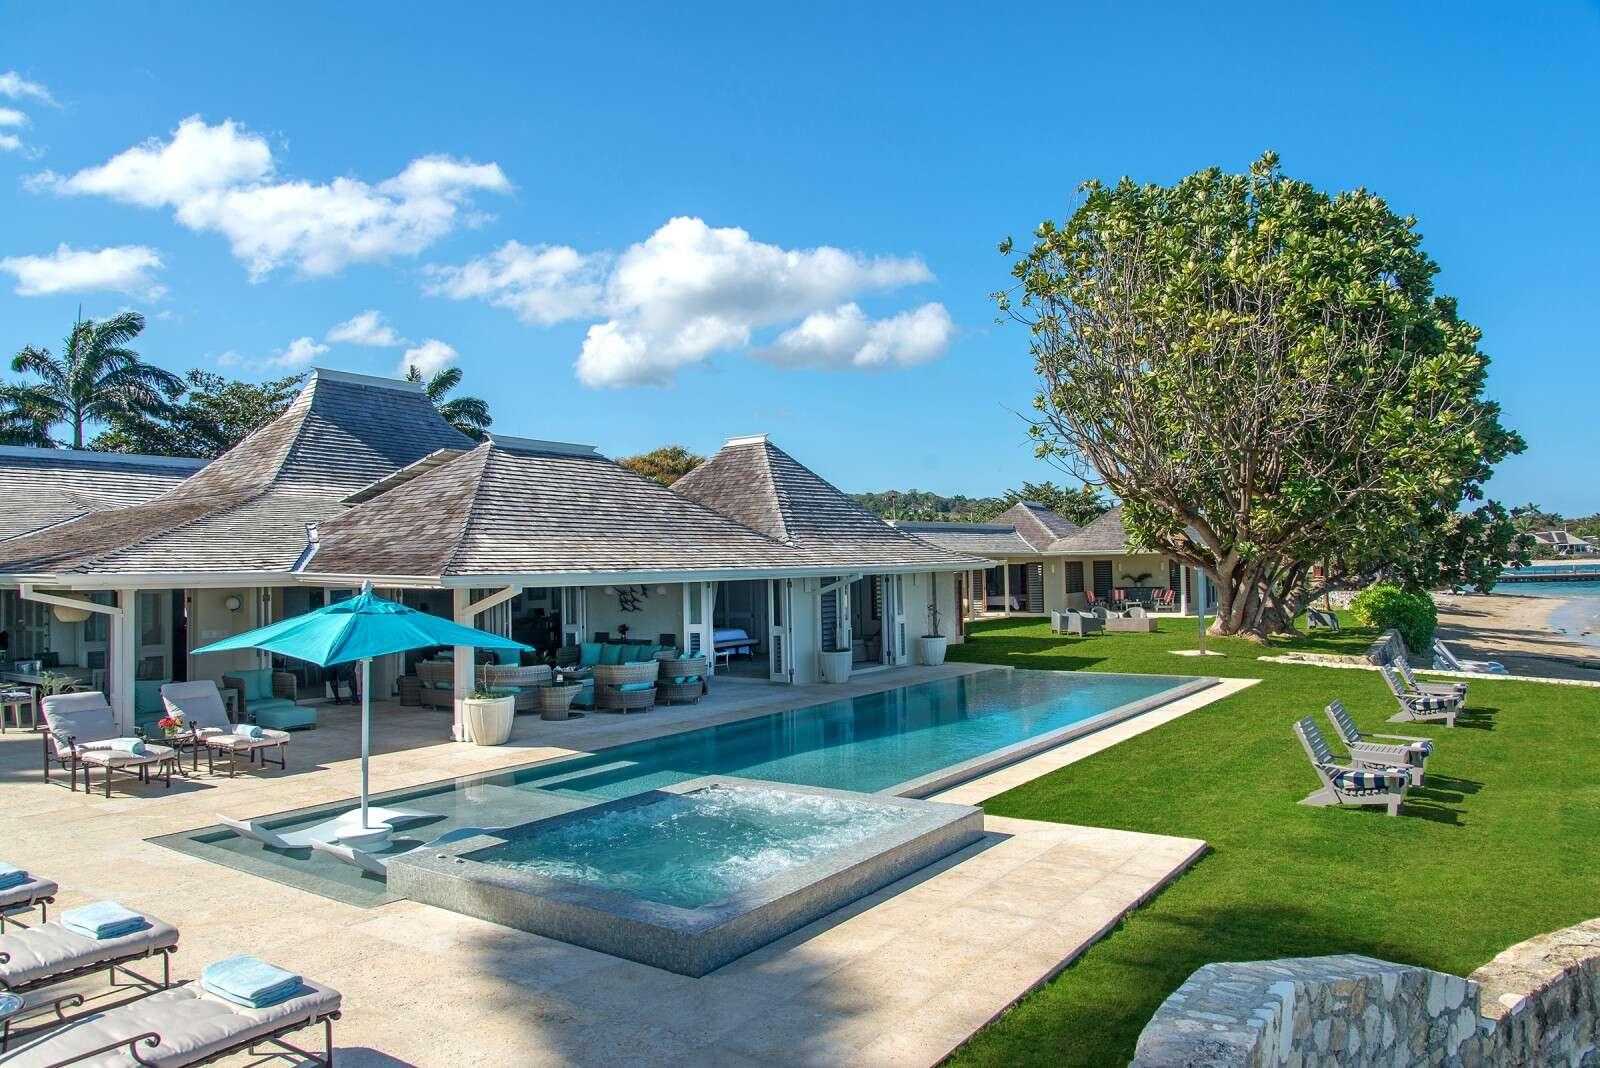 Luxury villa rentals caribbean - Jamaica - Try all club - No location 4 - Villa Sunset - Image 1/18